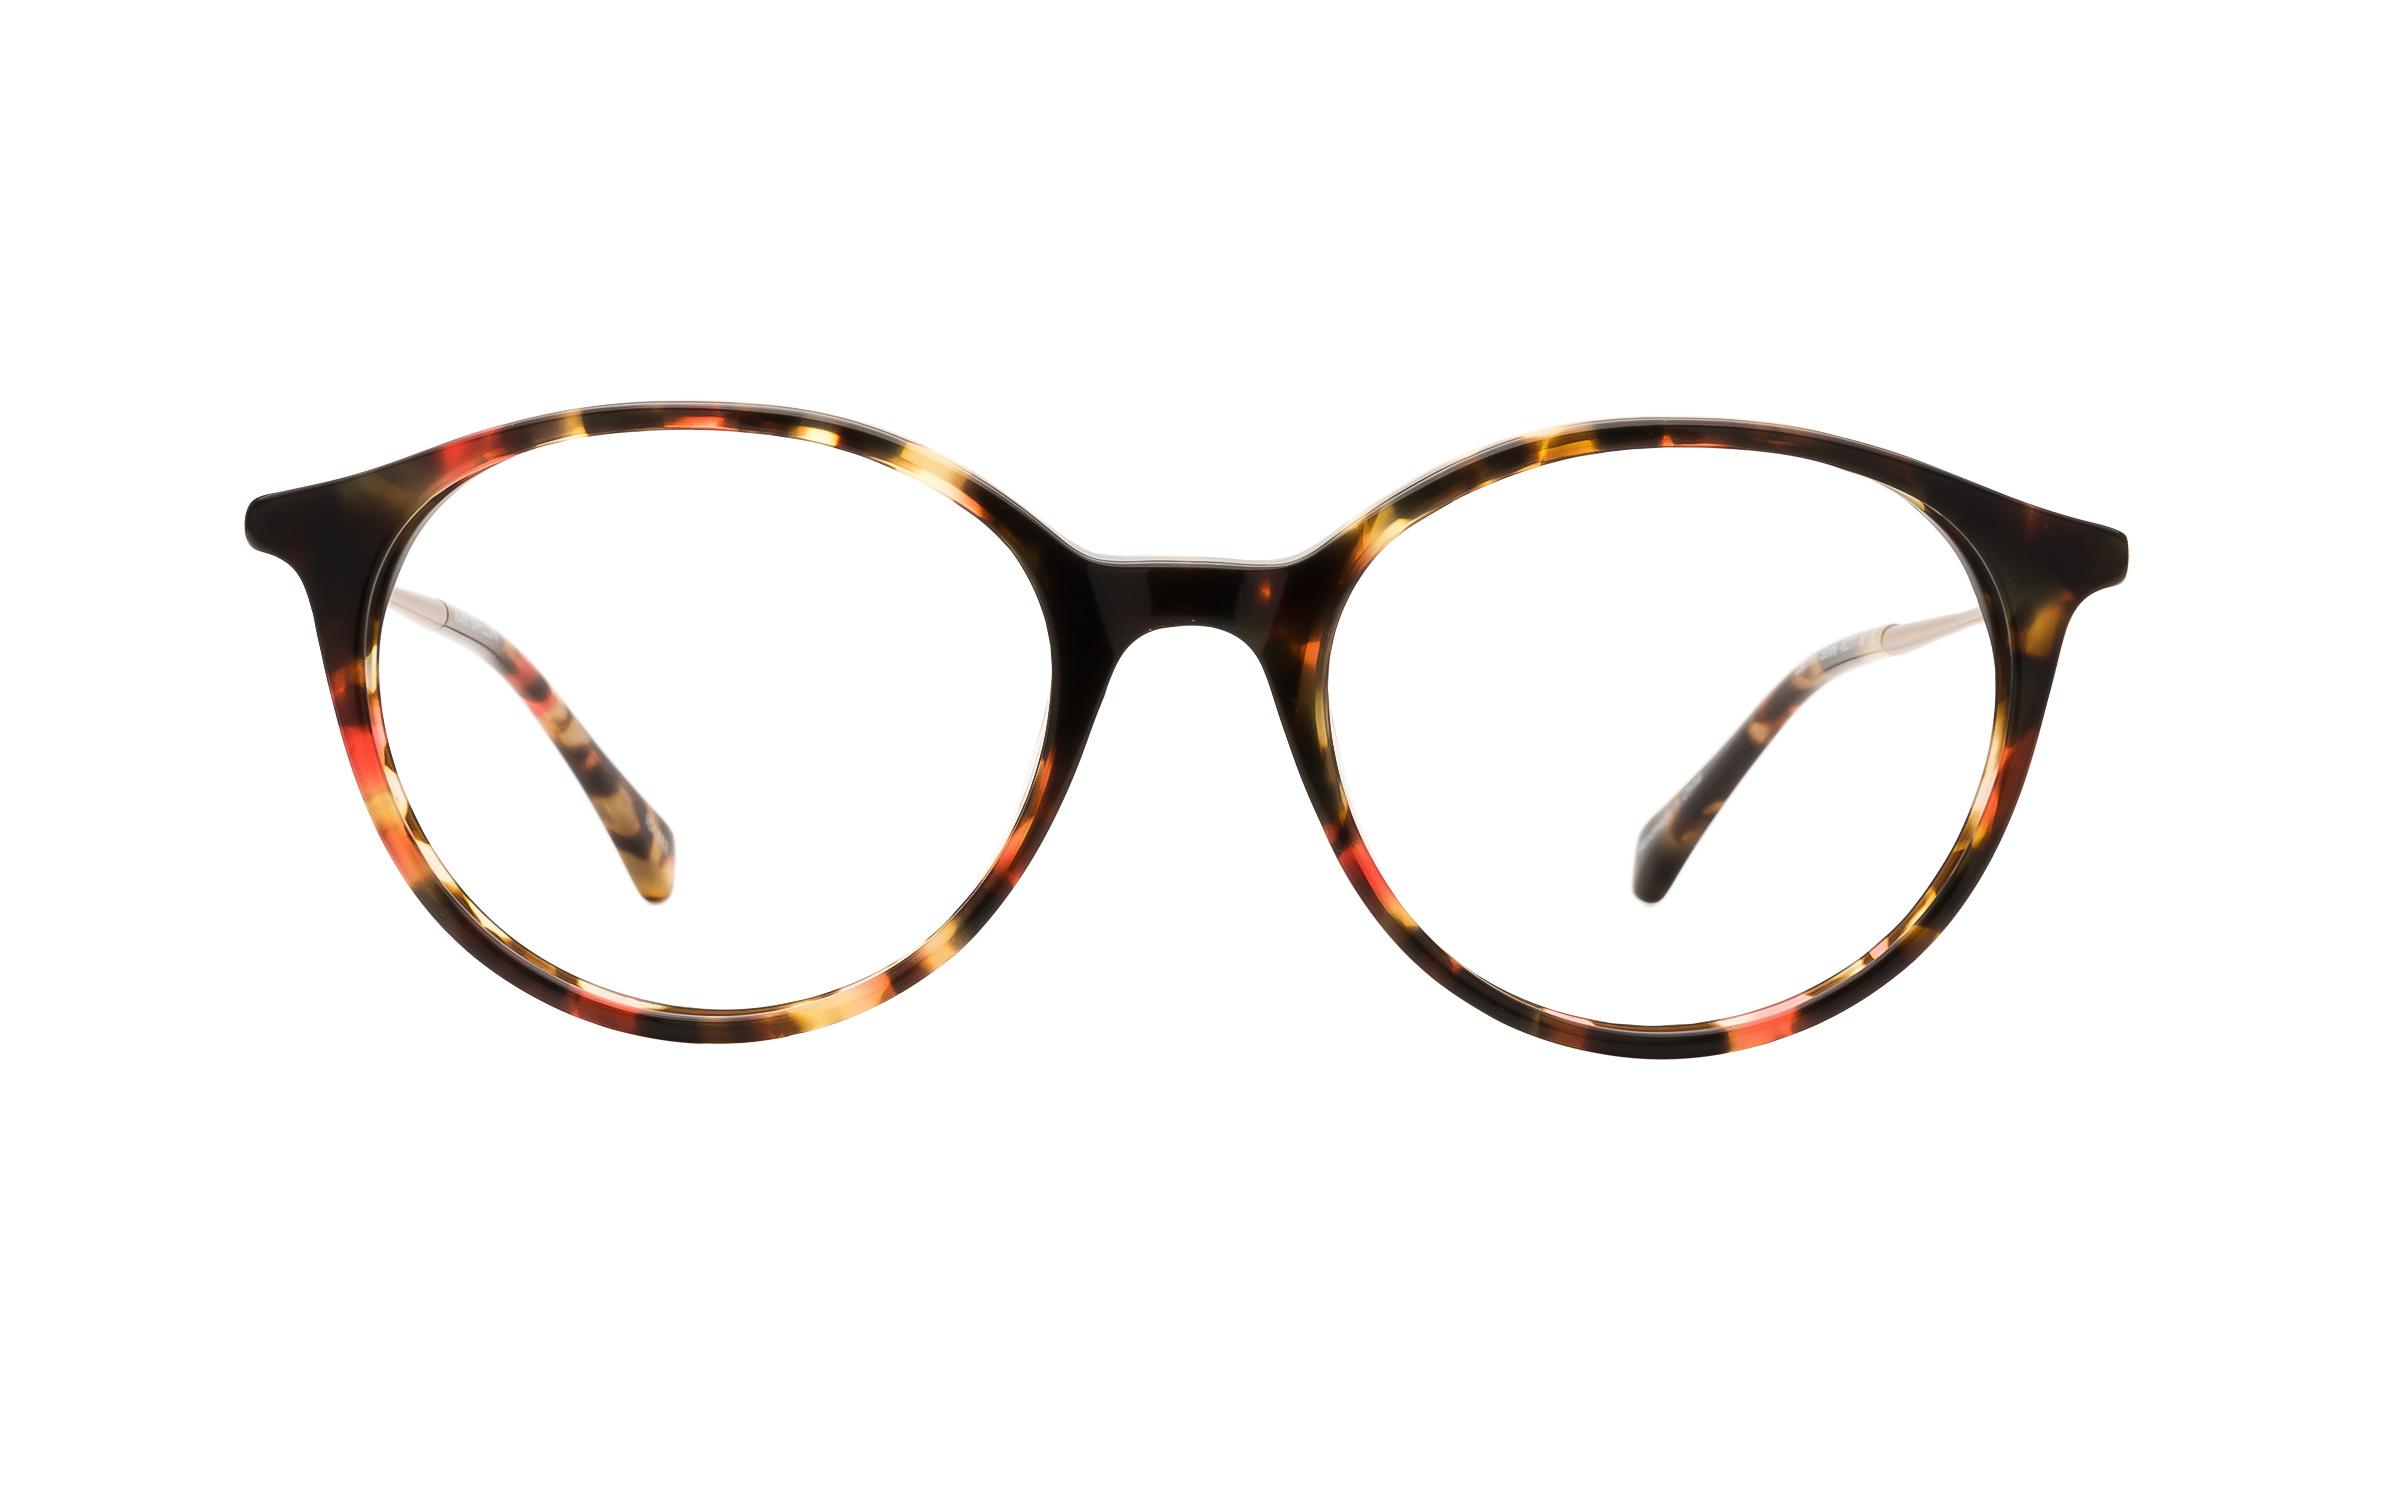 Kam_Dhillon_Womens_Glasses_Round_BrownRedTortoise_PlasticMetal_Online_Coastal